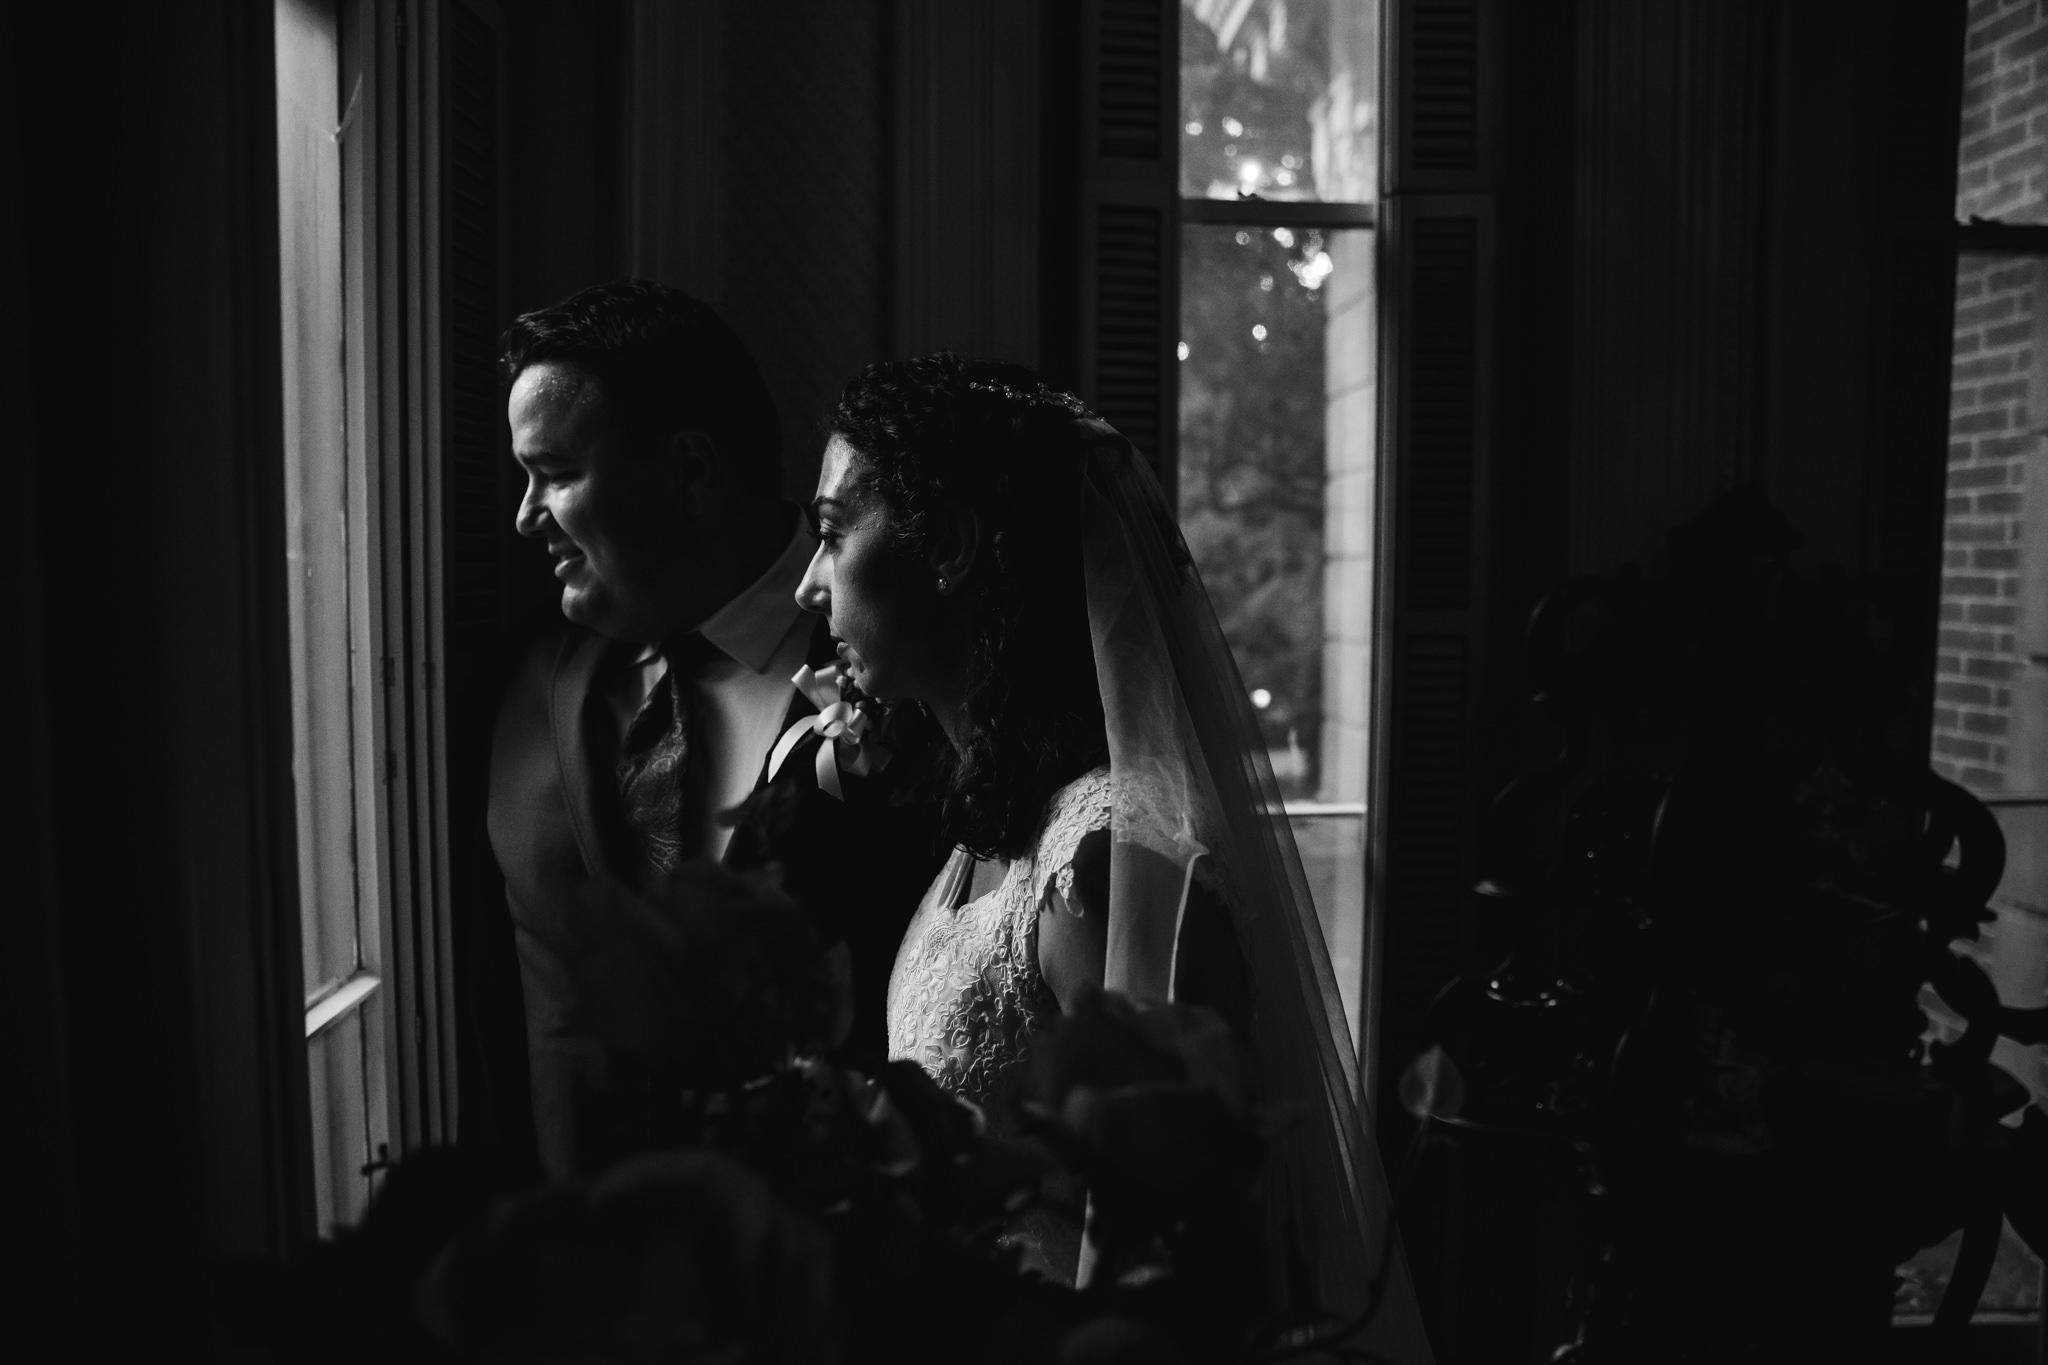 memphis-engagement-photographer-thewarmtharoundyou-33.jpg